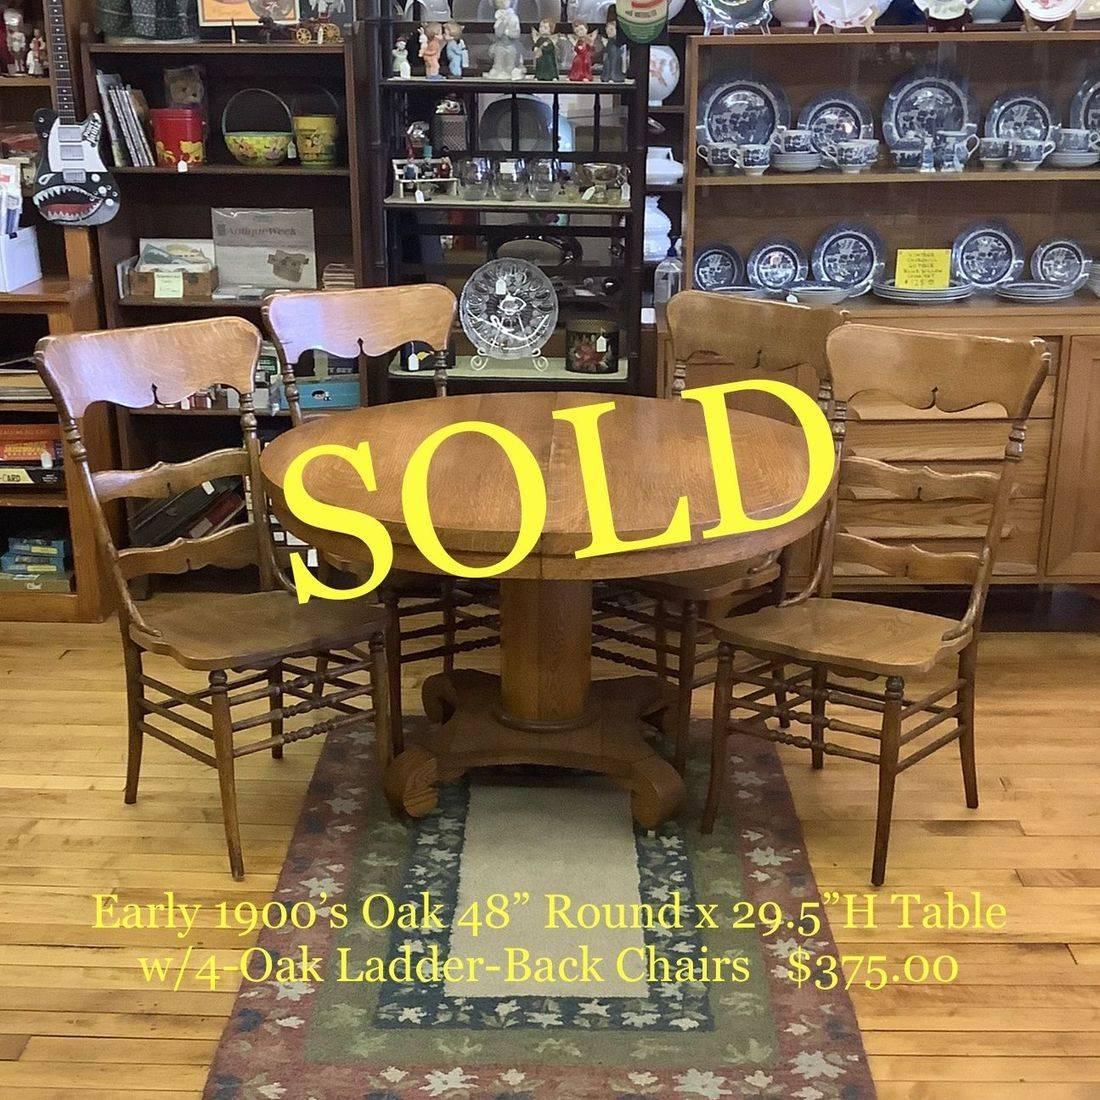 "Early 1900's Oak 48"" Round Table w/4- Ladder-Back Oak Chairs  $375.00"